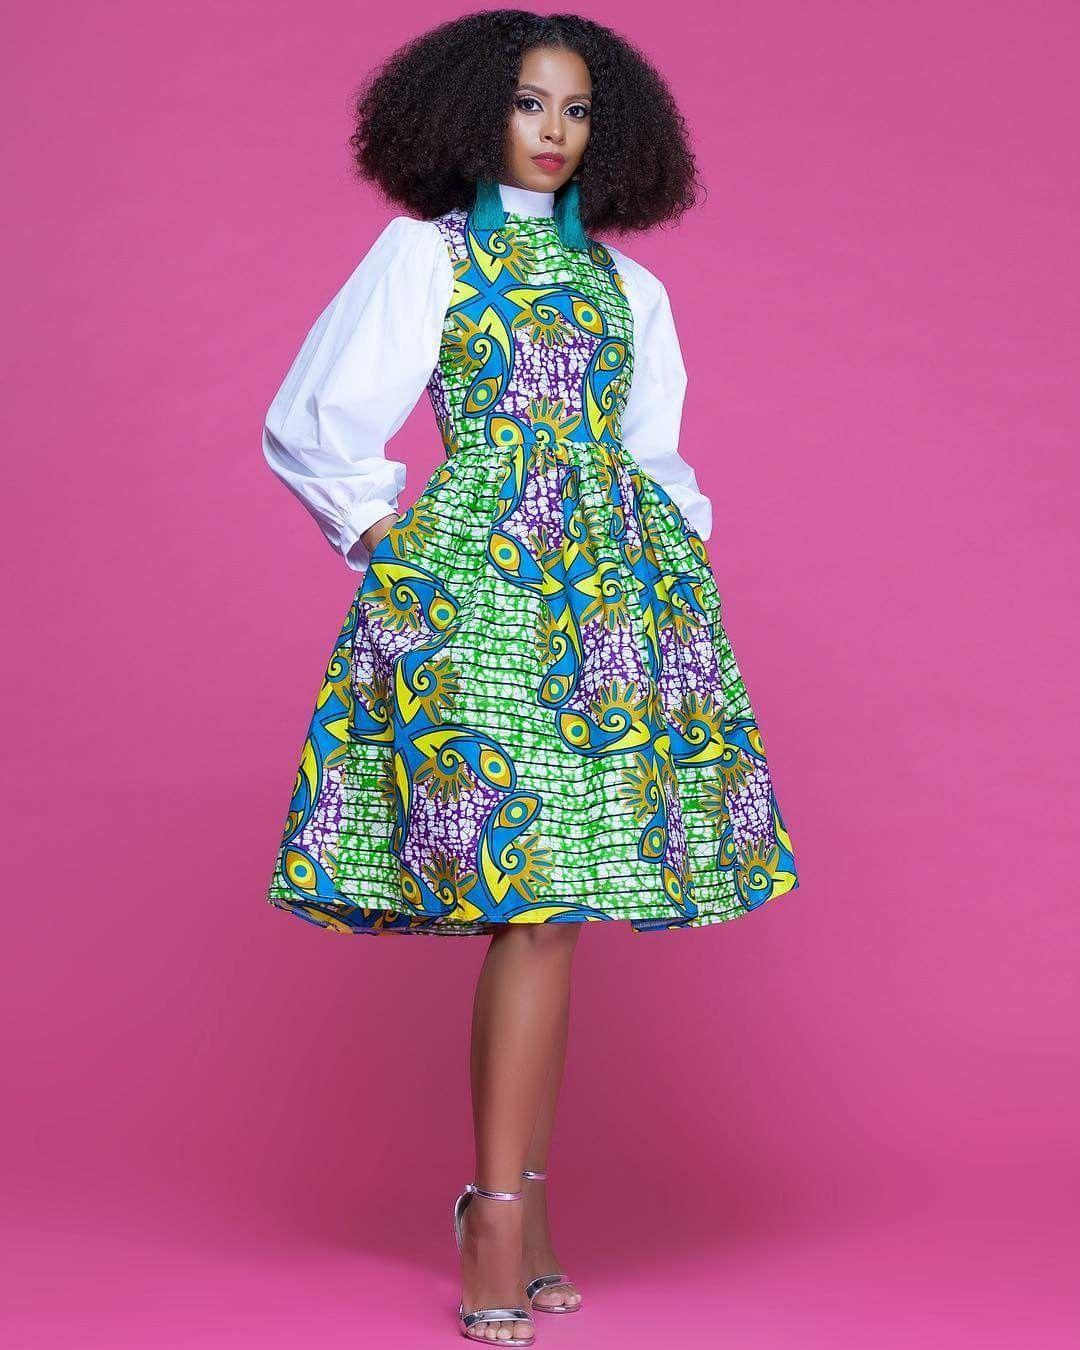 Pin de Nelza Raimundo en Moda africana | Pinterest | Africanos y ...